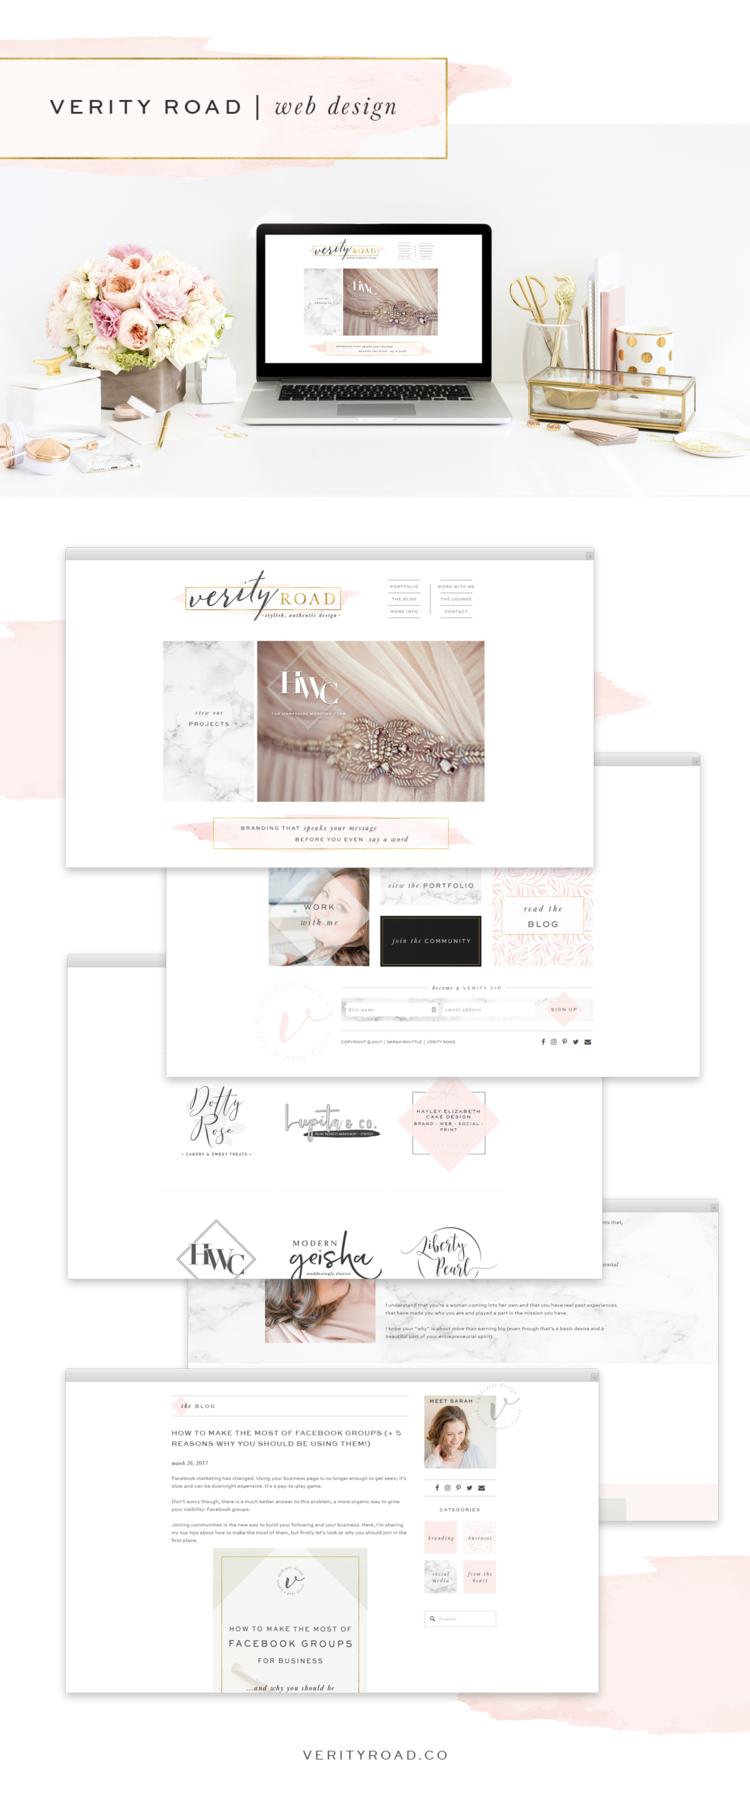 Brand Web Design Verity Road Luxury Branding For Female Entrepreneurs Web Design Simple Website Design Web Design Inspiration